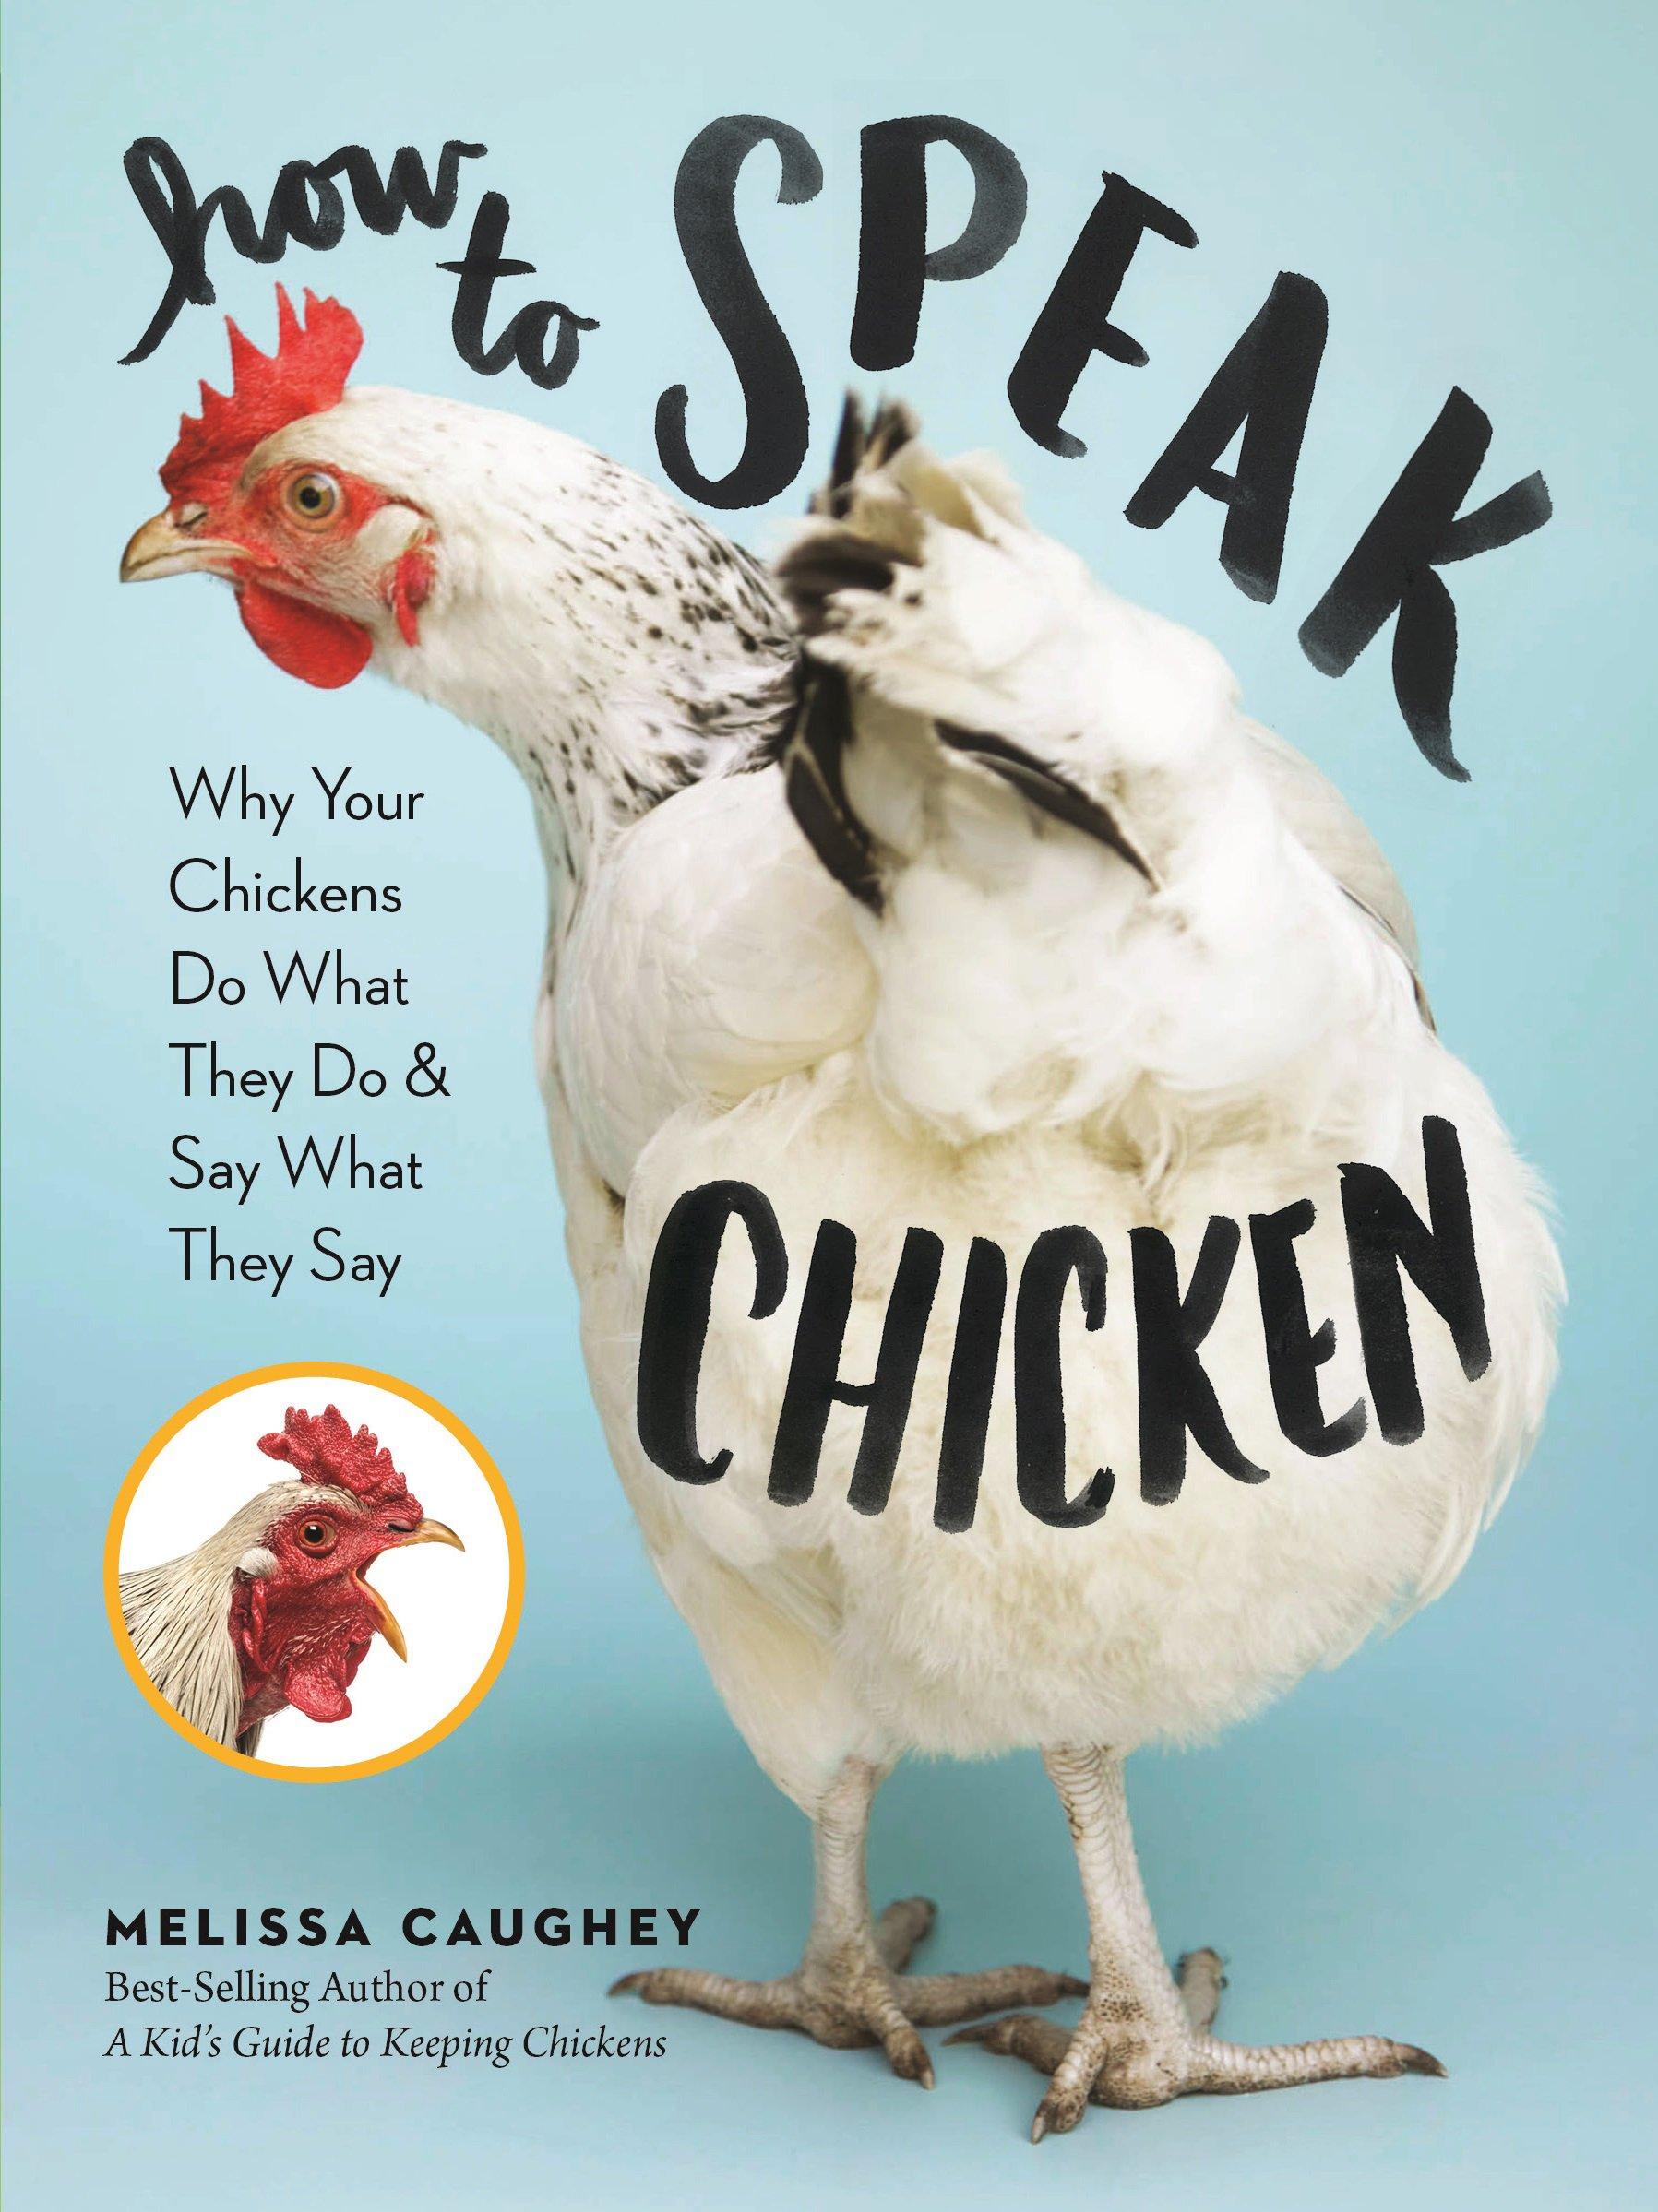 Good Morning Sunday Chicken : How to speak chicken tilly s nest